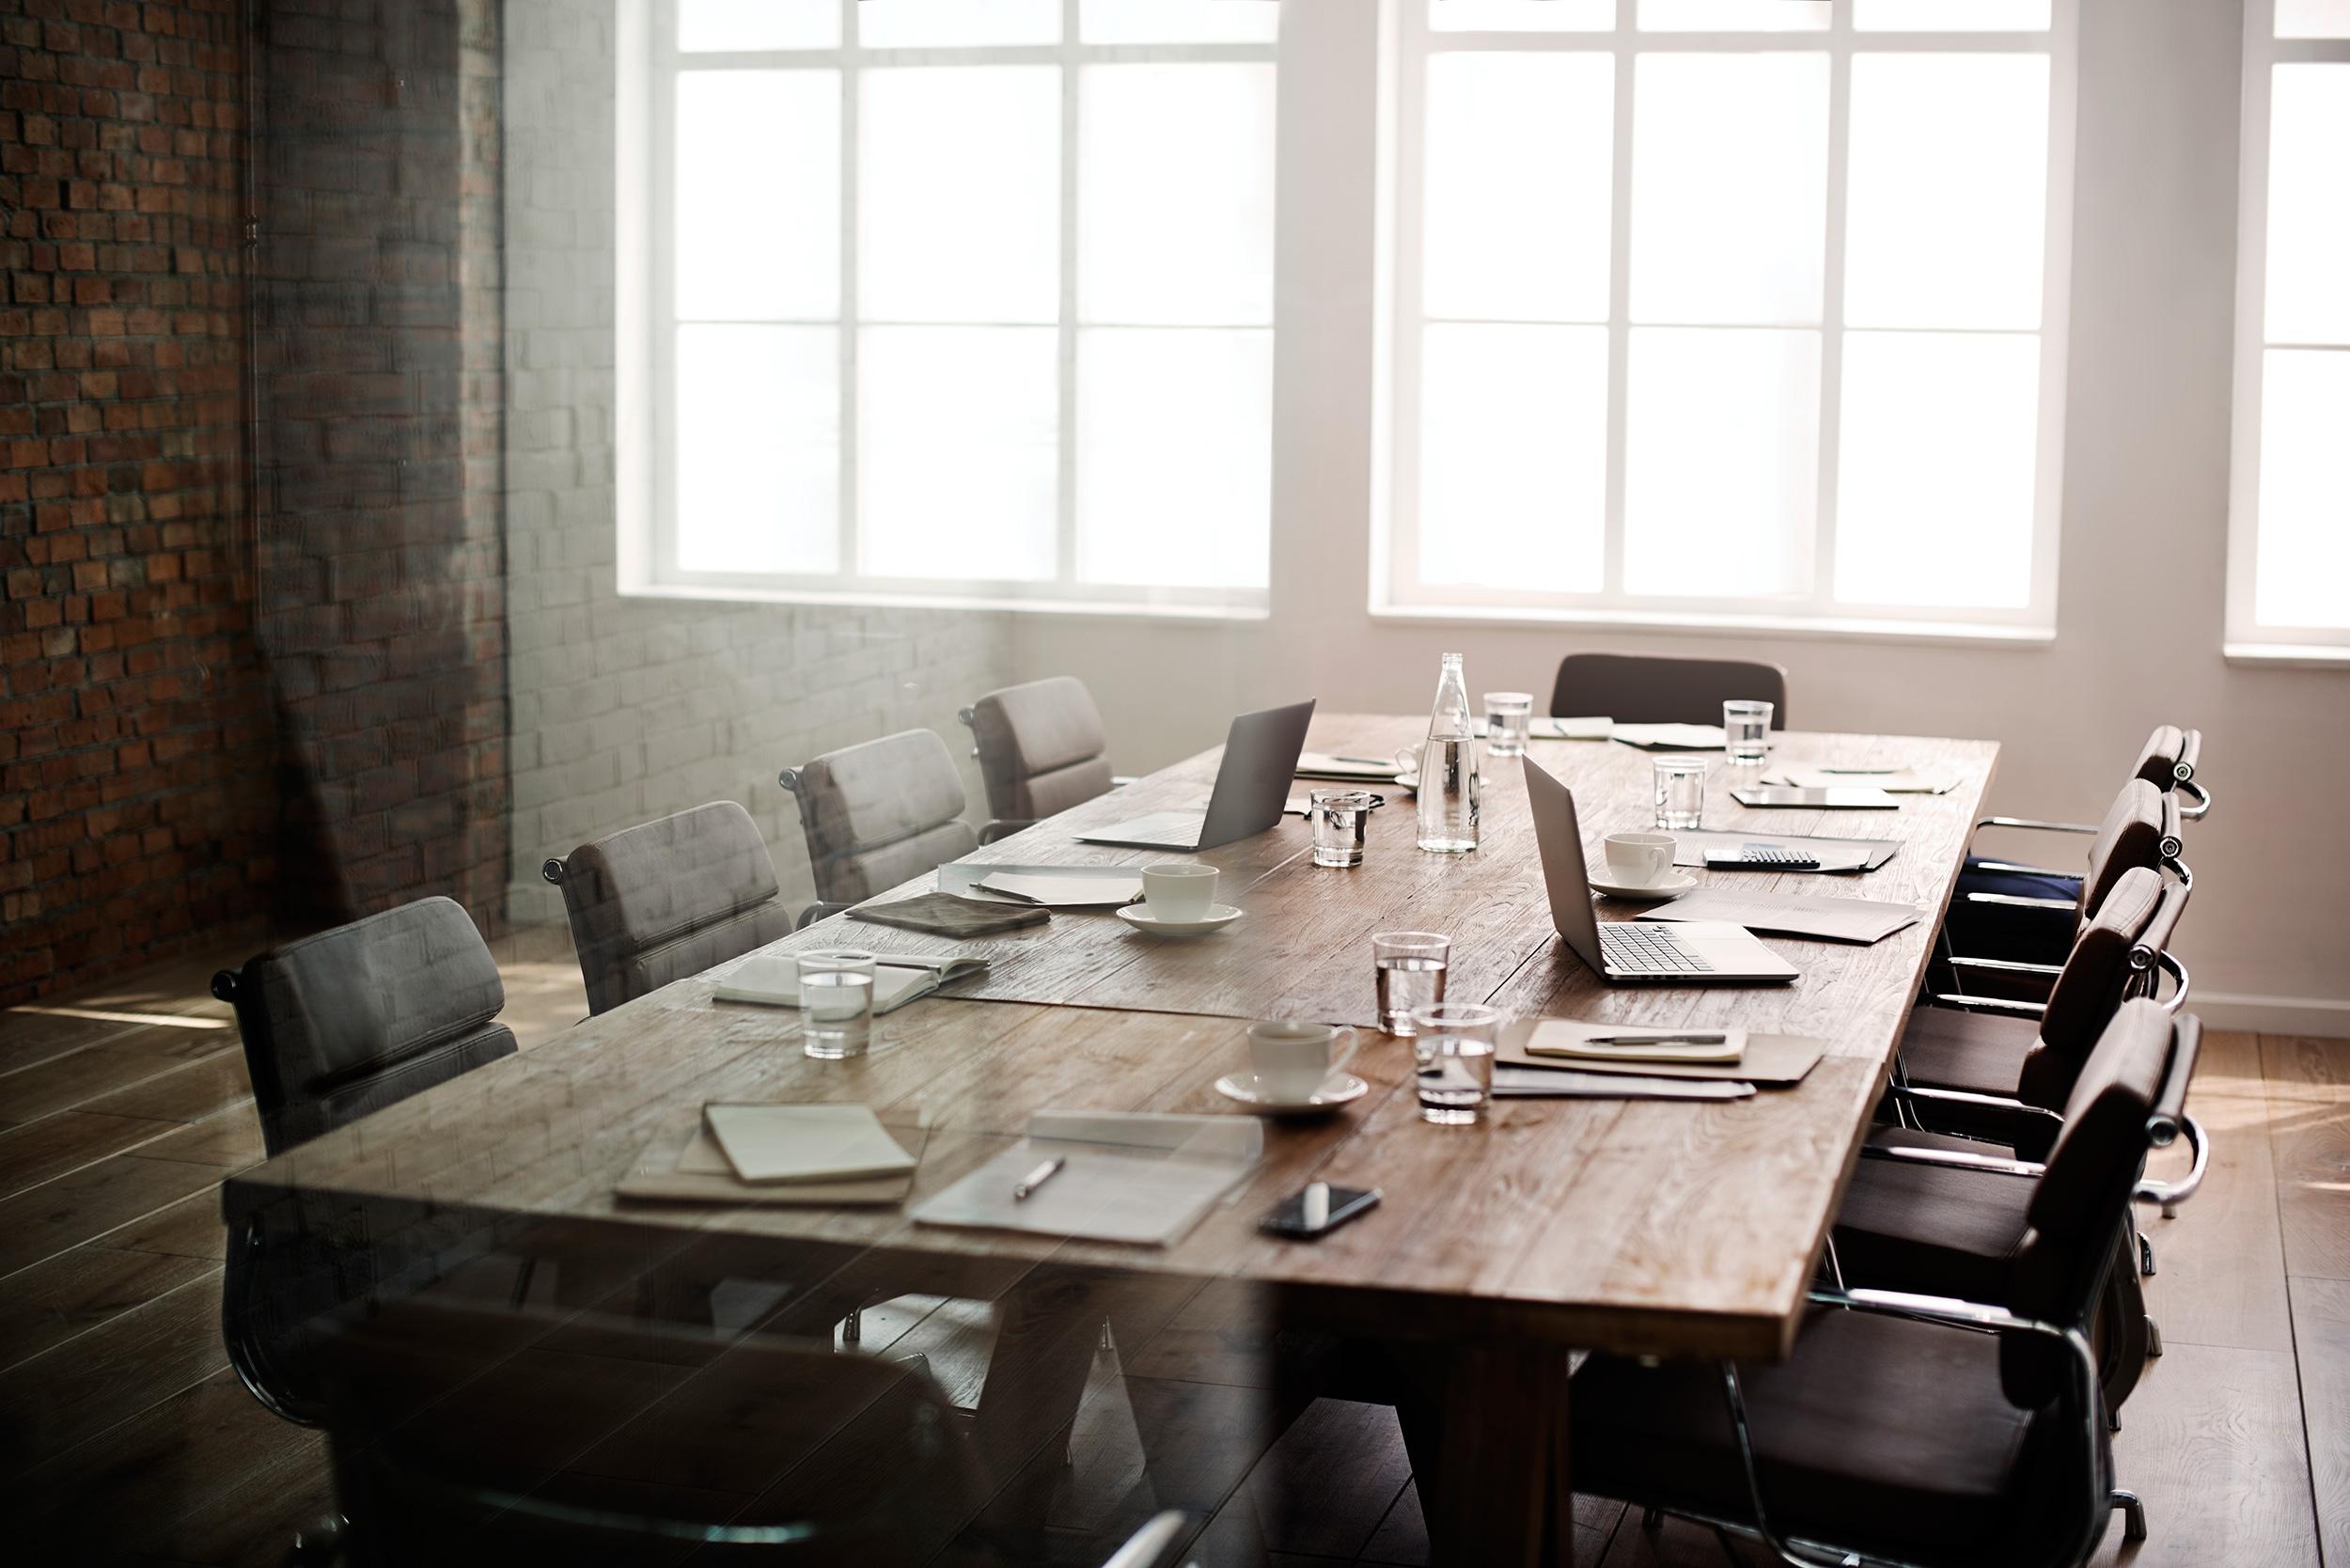 Board-Management-71181-2500